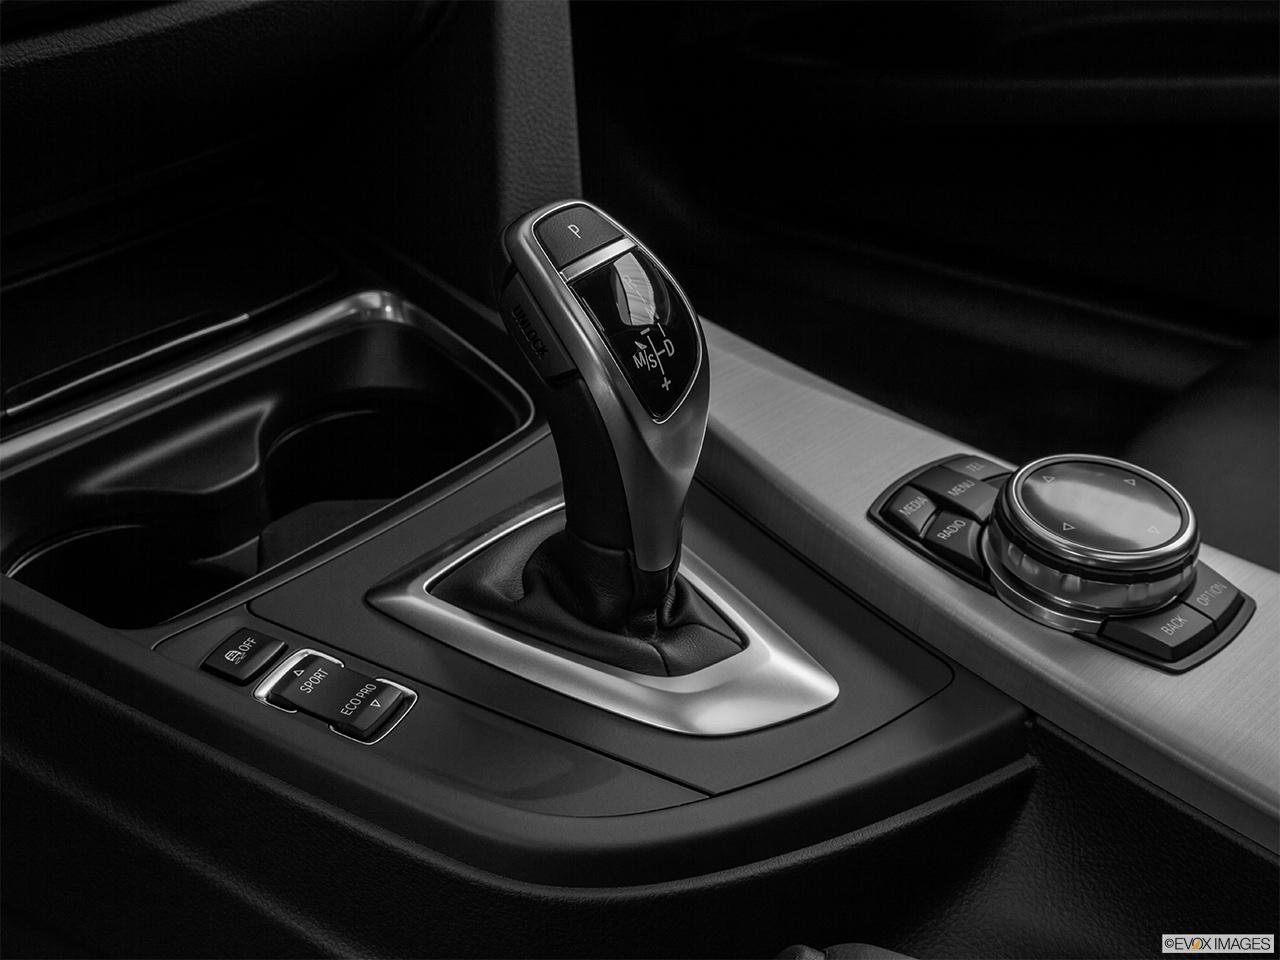 2014 Bmw 3 Series 5 Door 335i Xdrive Gran Turismo Gear